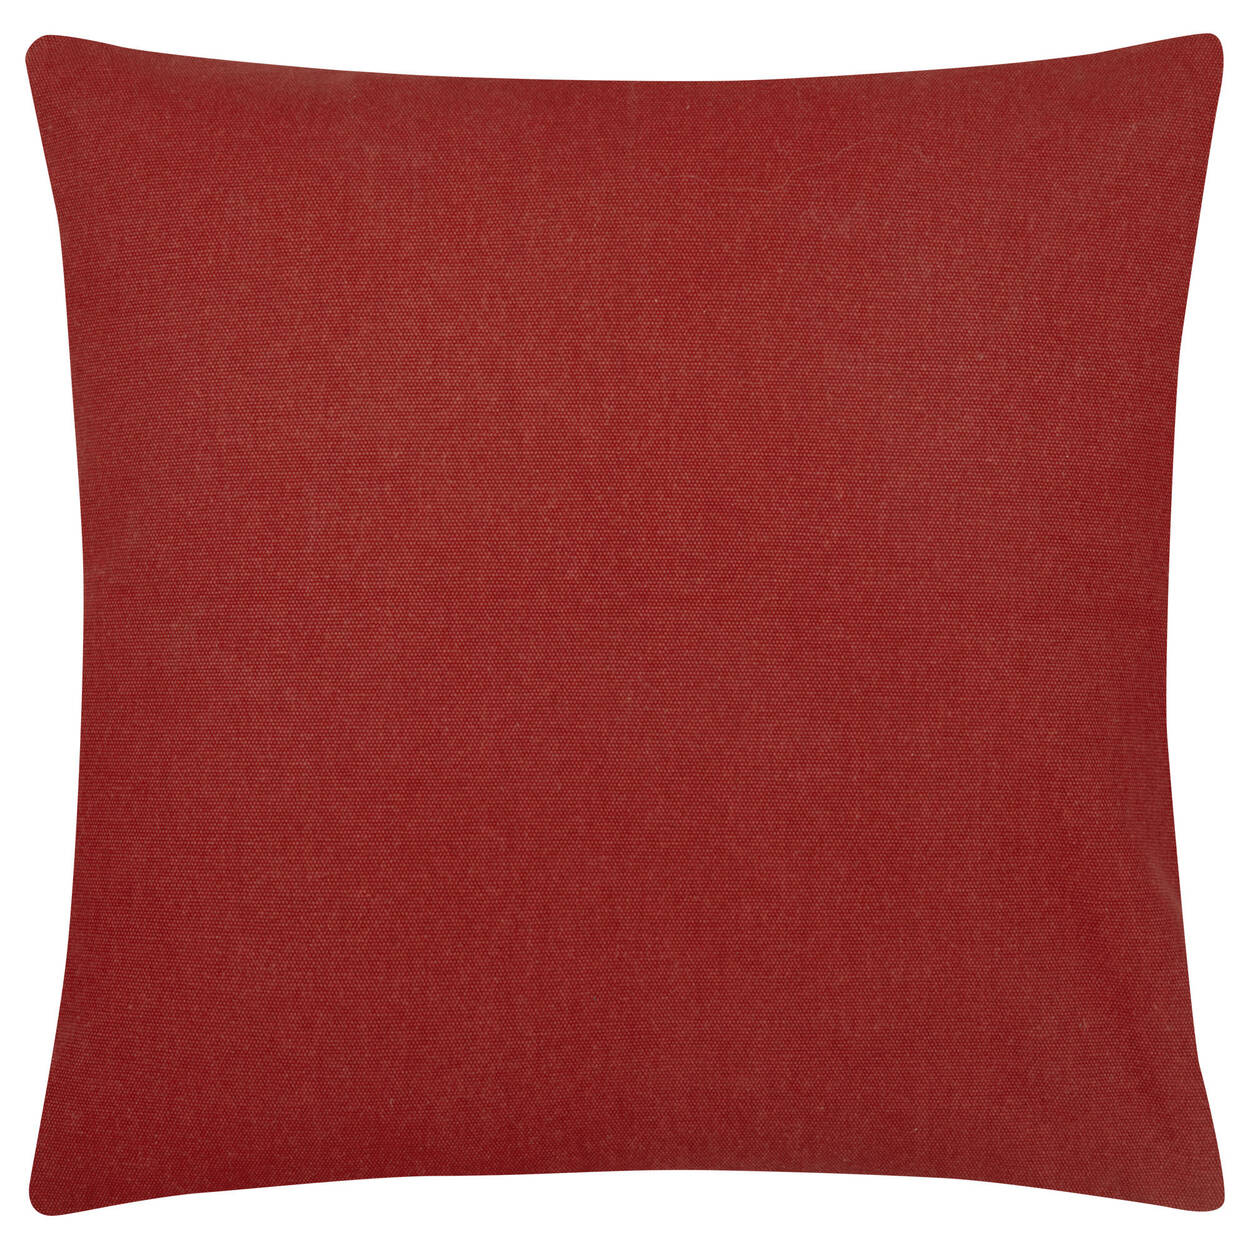 "Canoe Tours Decorative Pillow 18"" X 18"""